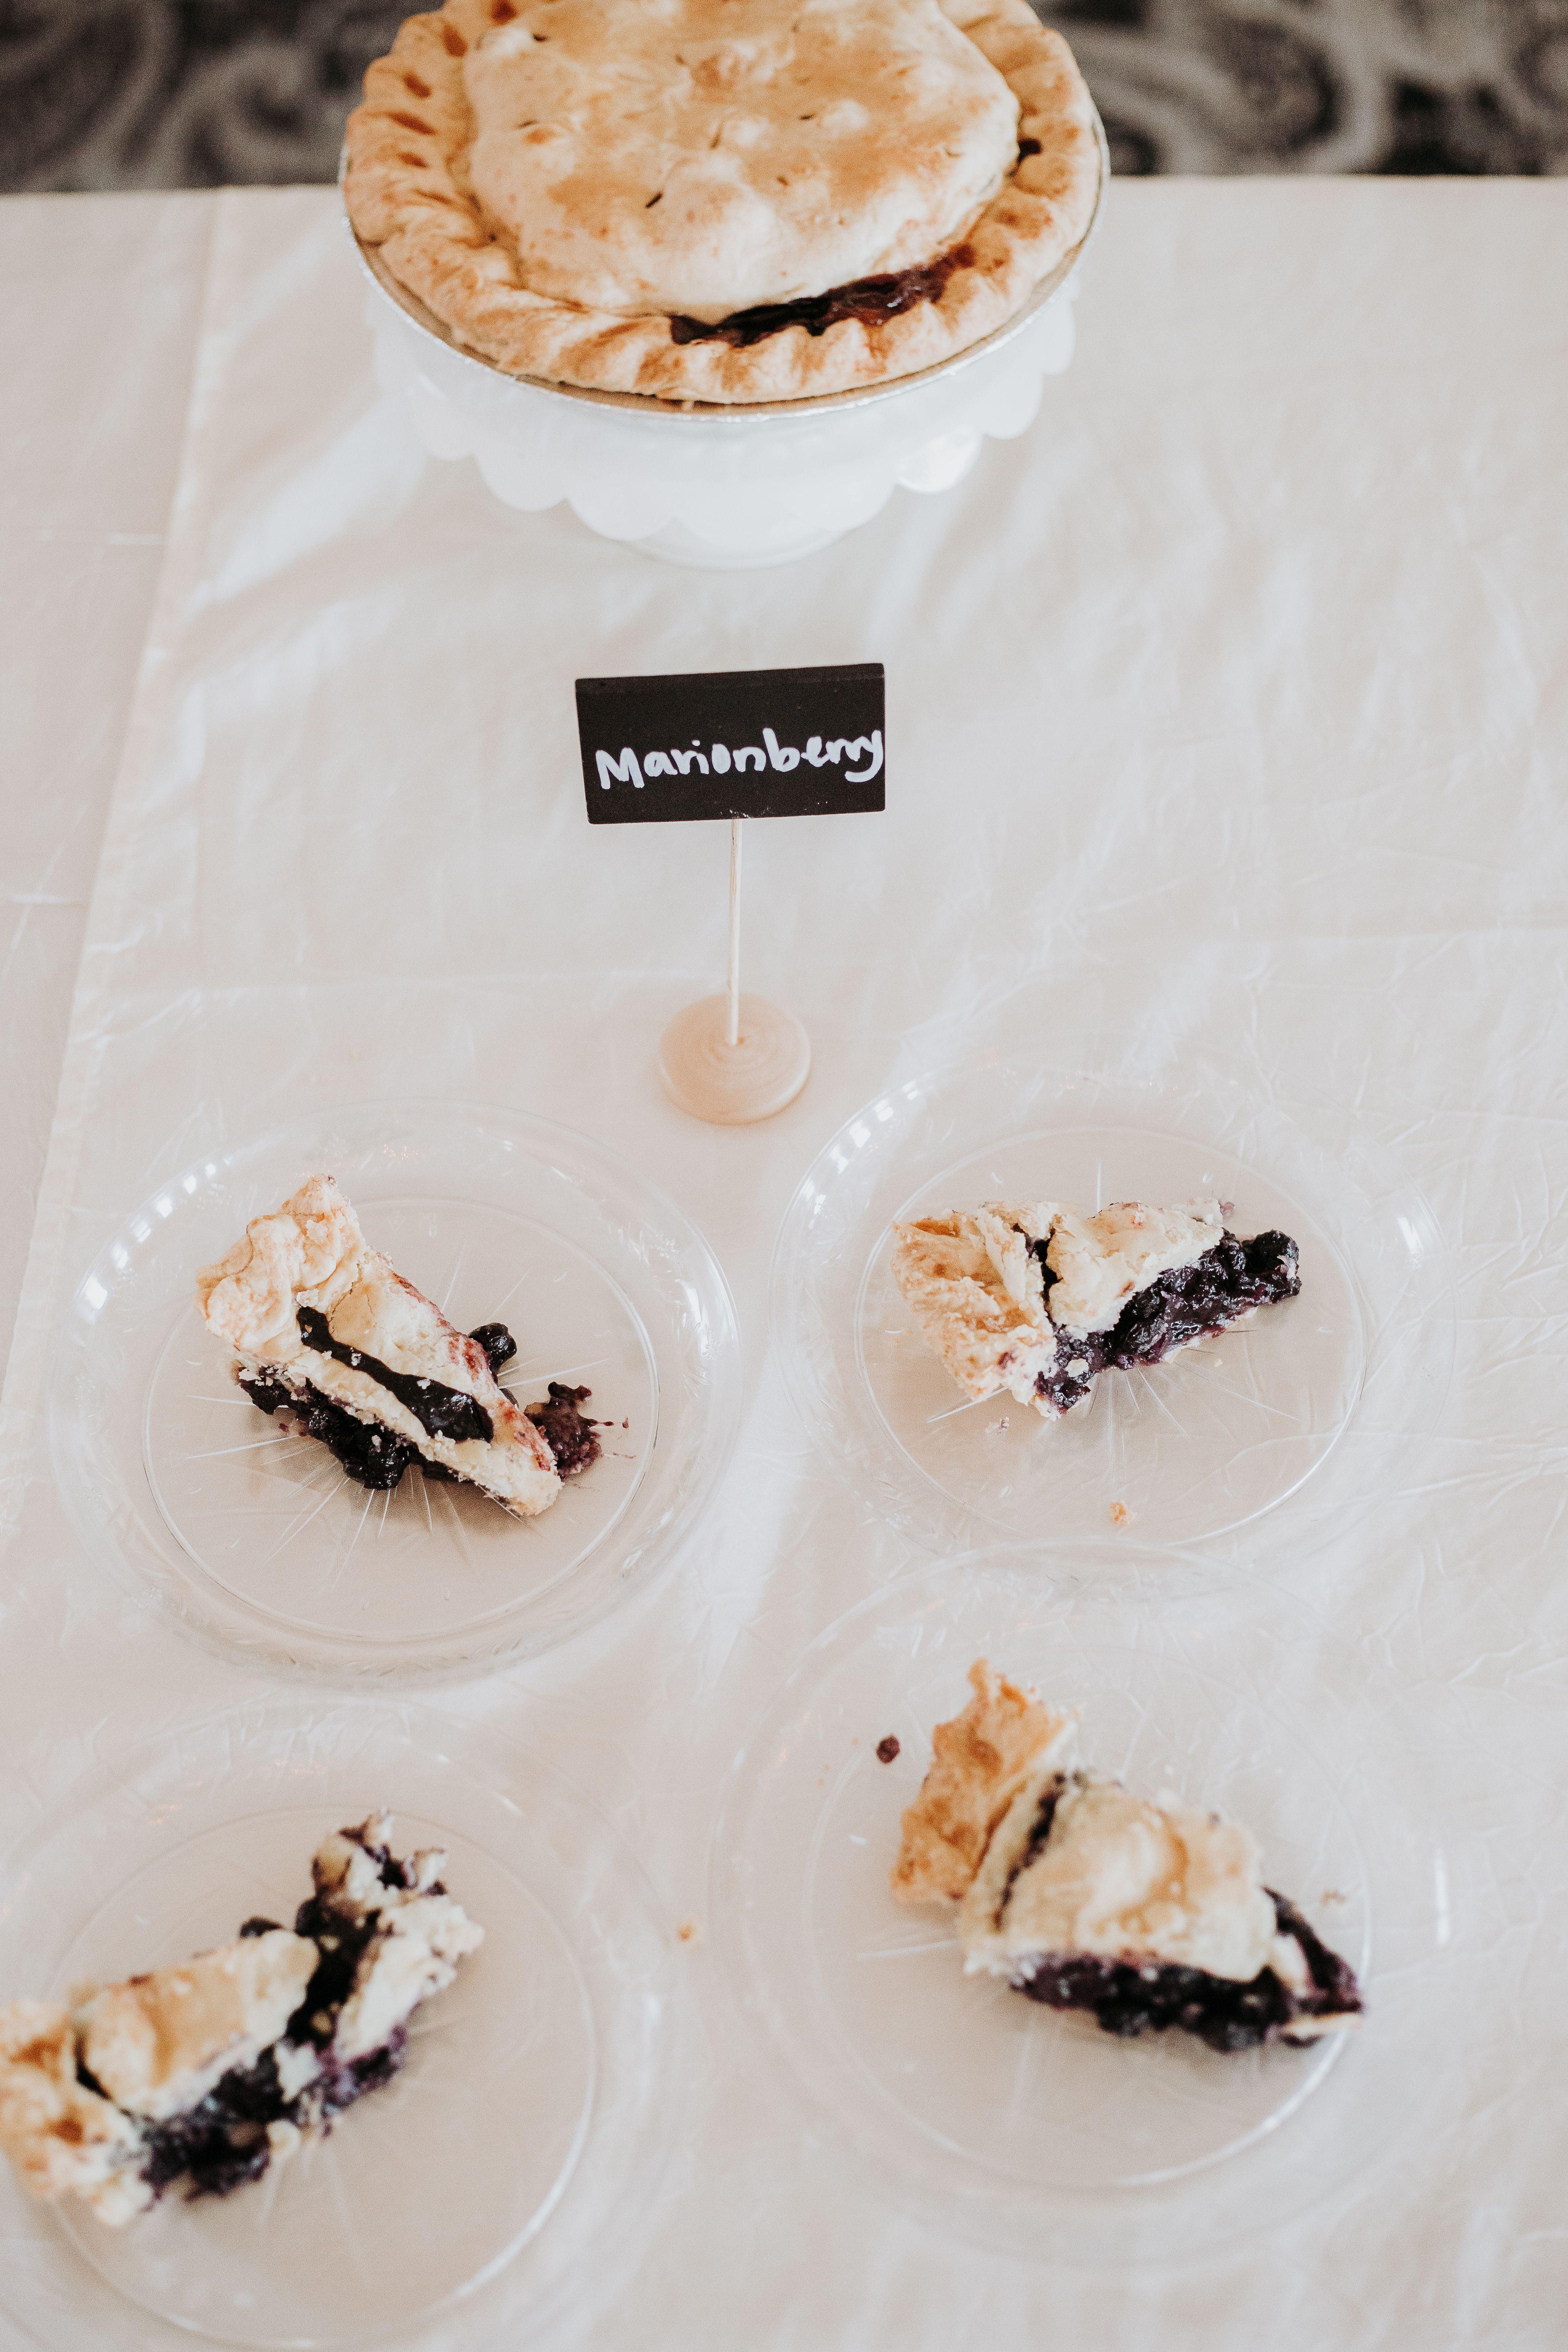 Pie Slices Healthy Fruit Desserts Fruit Salad Easy Pie Company